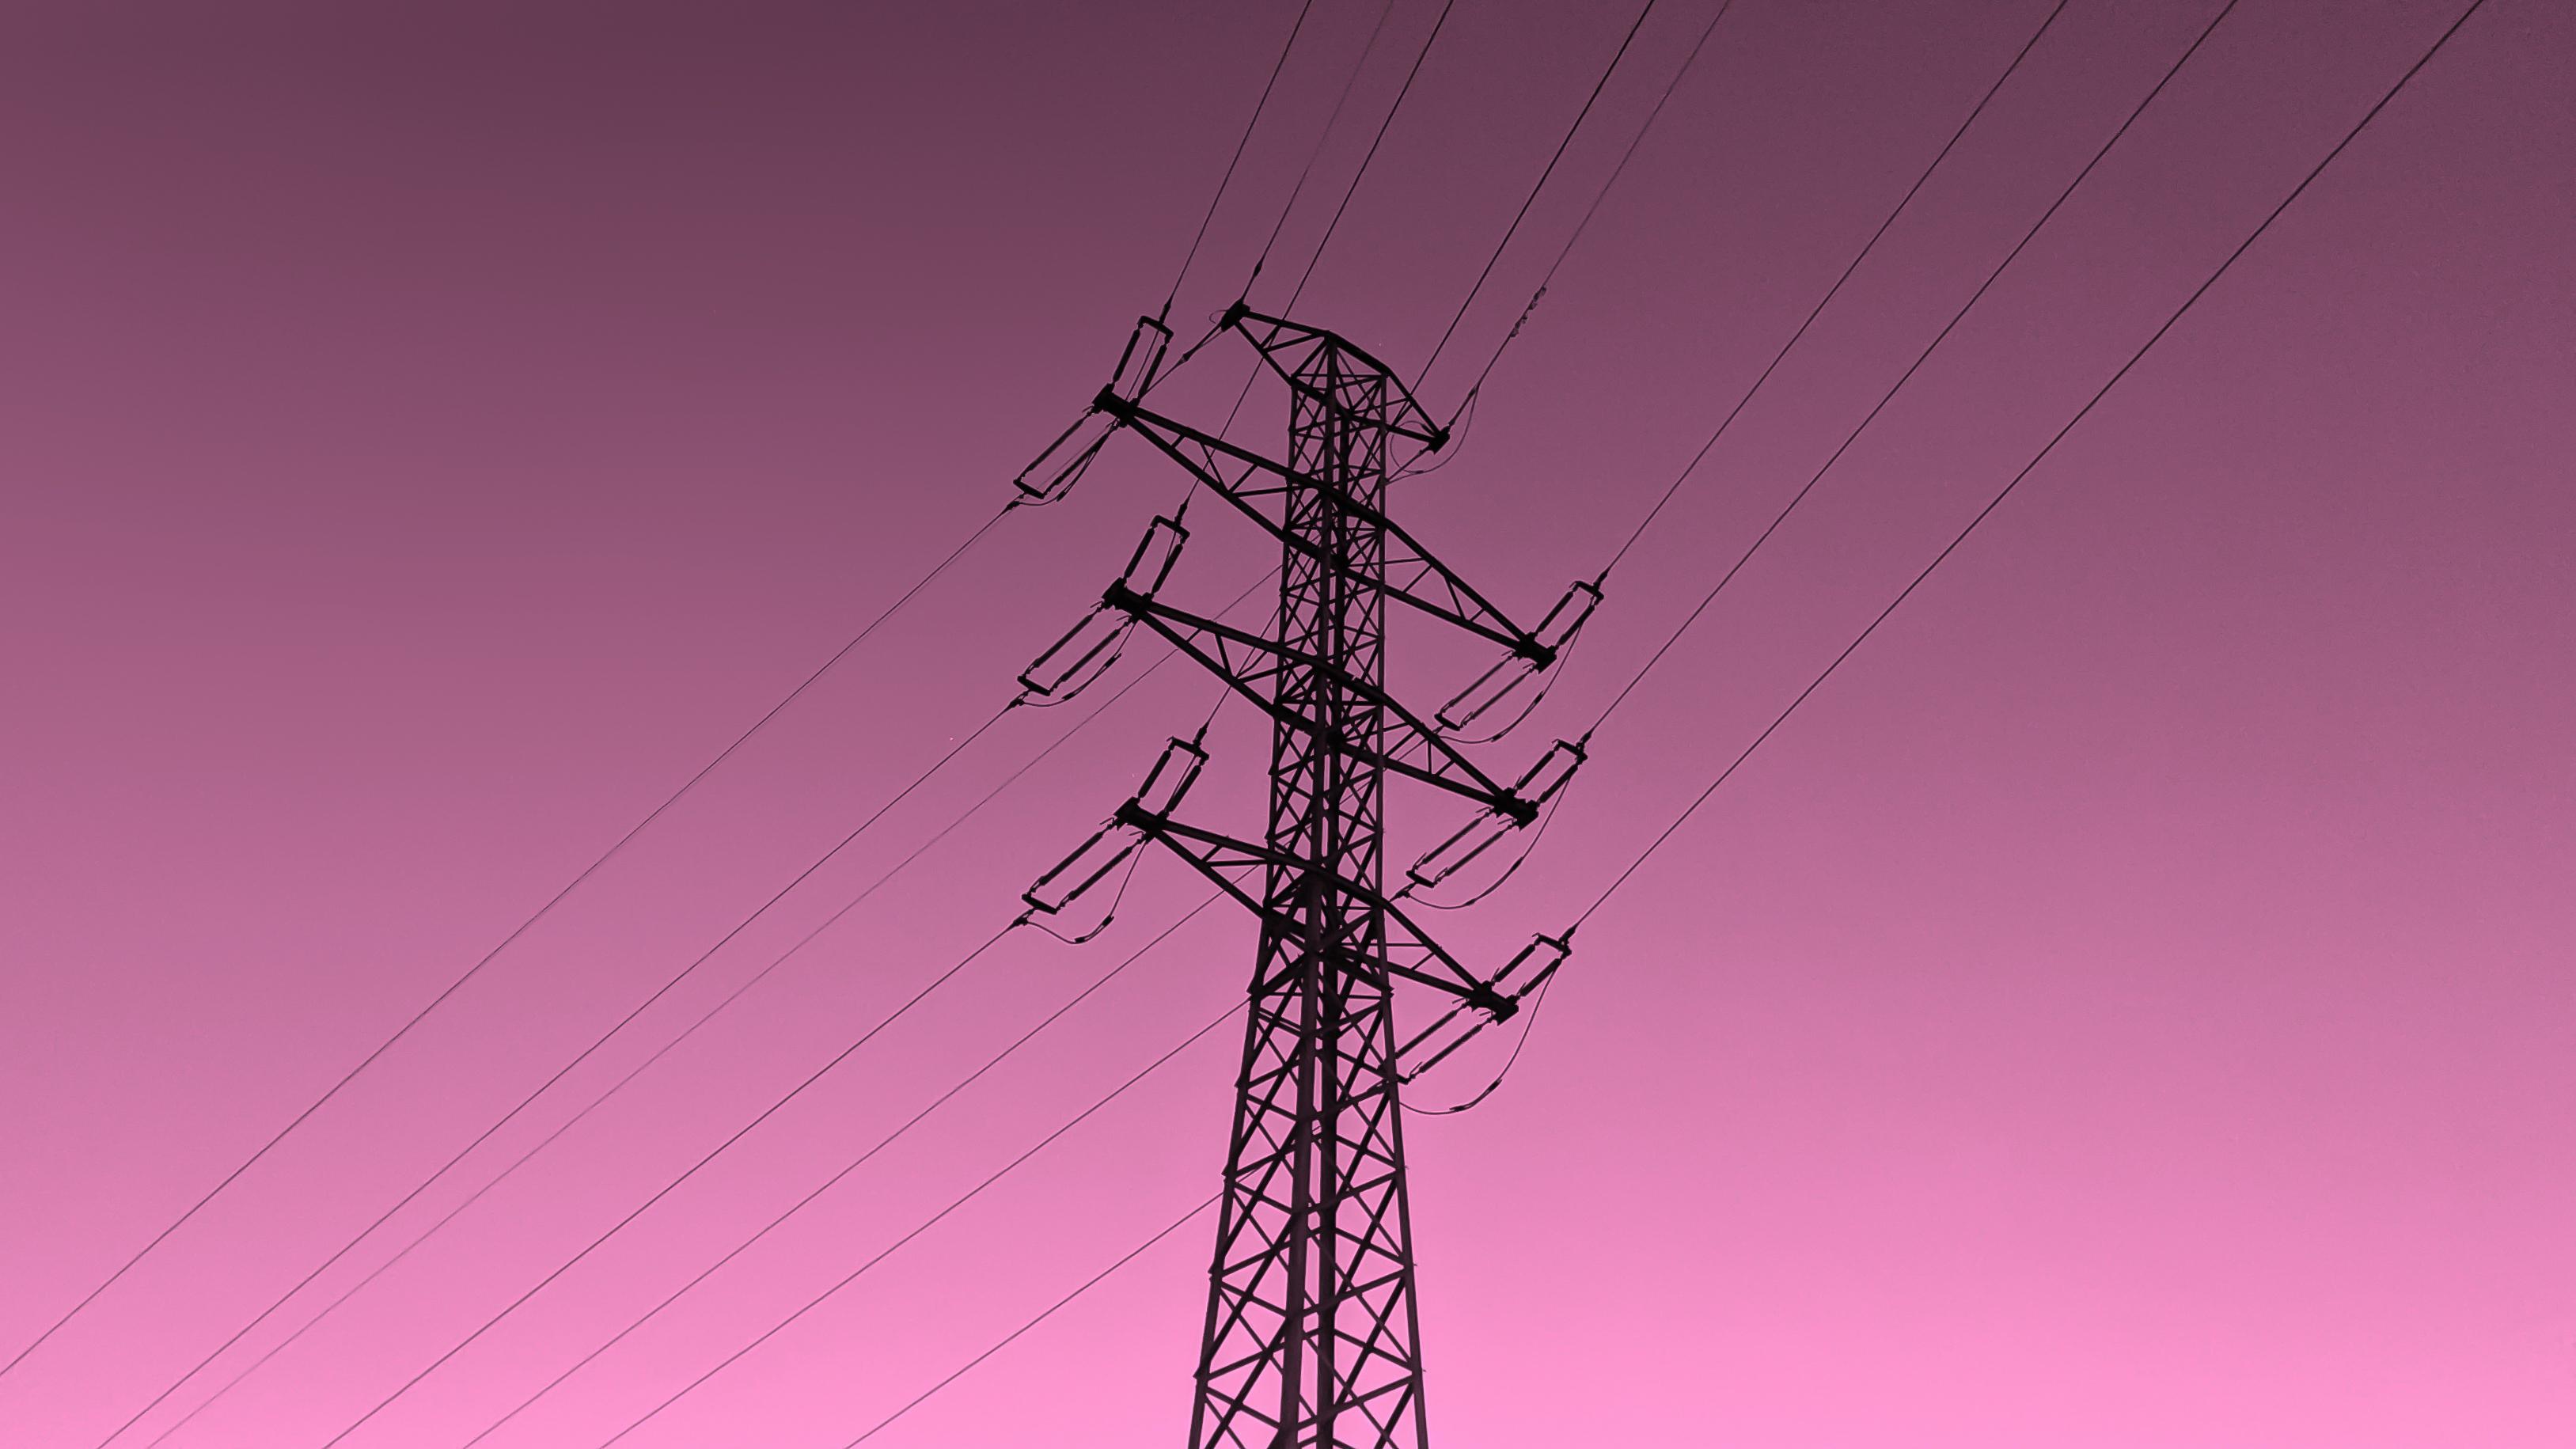 A Sunset Full Of Energy Wallpaper Transmission Tower 3255x1831 Wallpaper Teahub Io